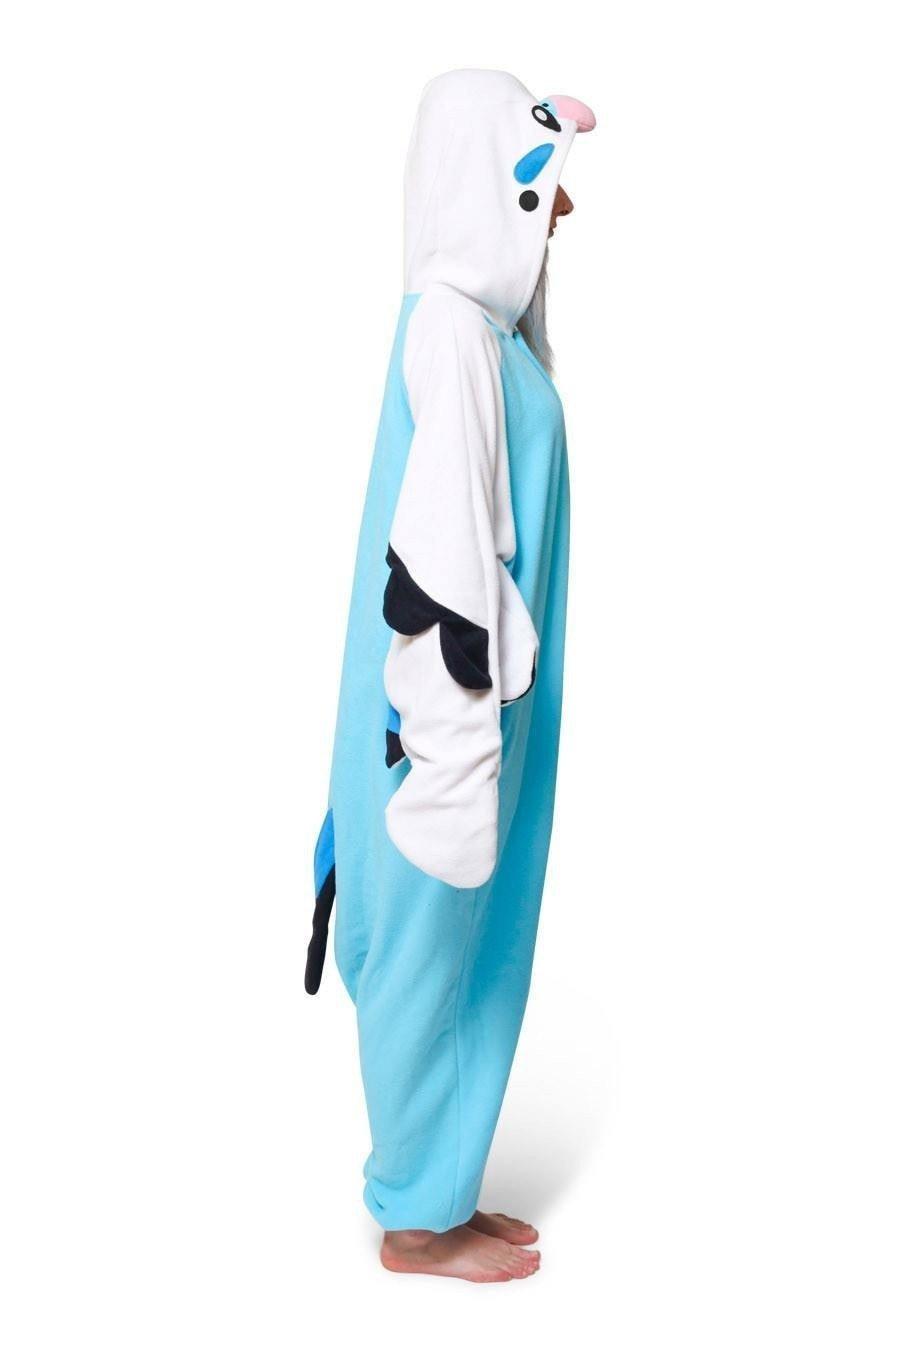 Unisex Fleece Adult Piplup Blue Parrot Onesies Animal Cosplay Costume Halloween Xmas Pajama